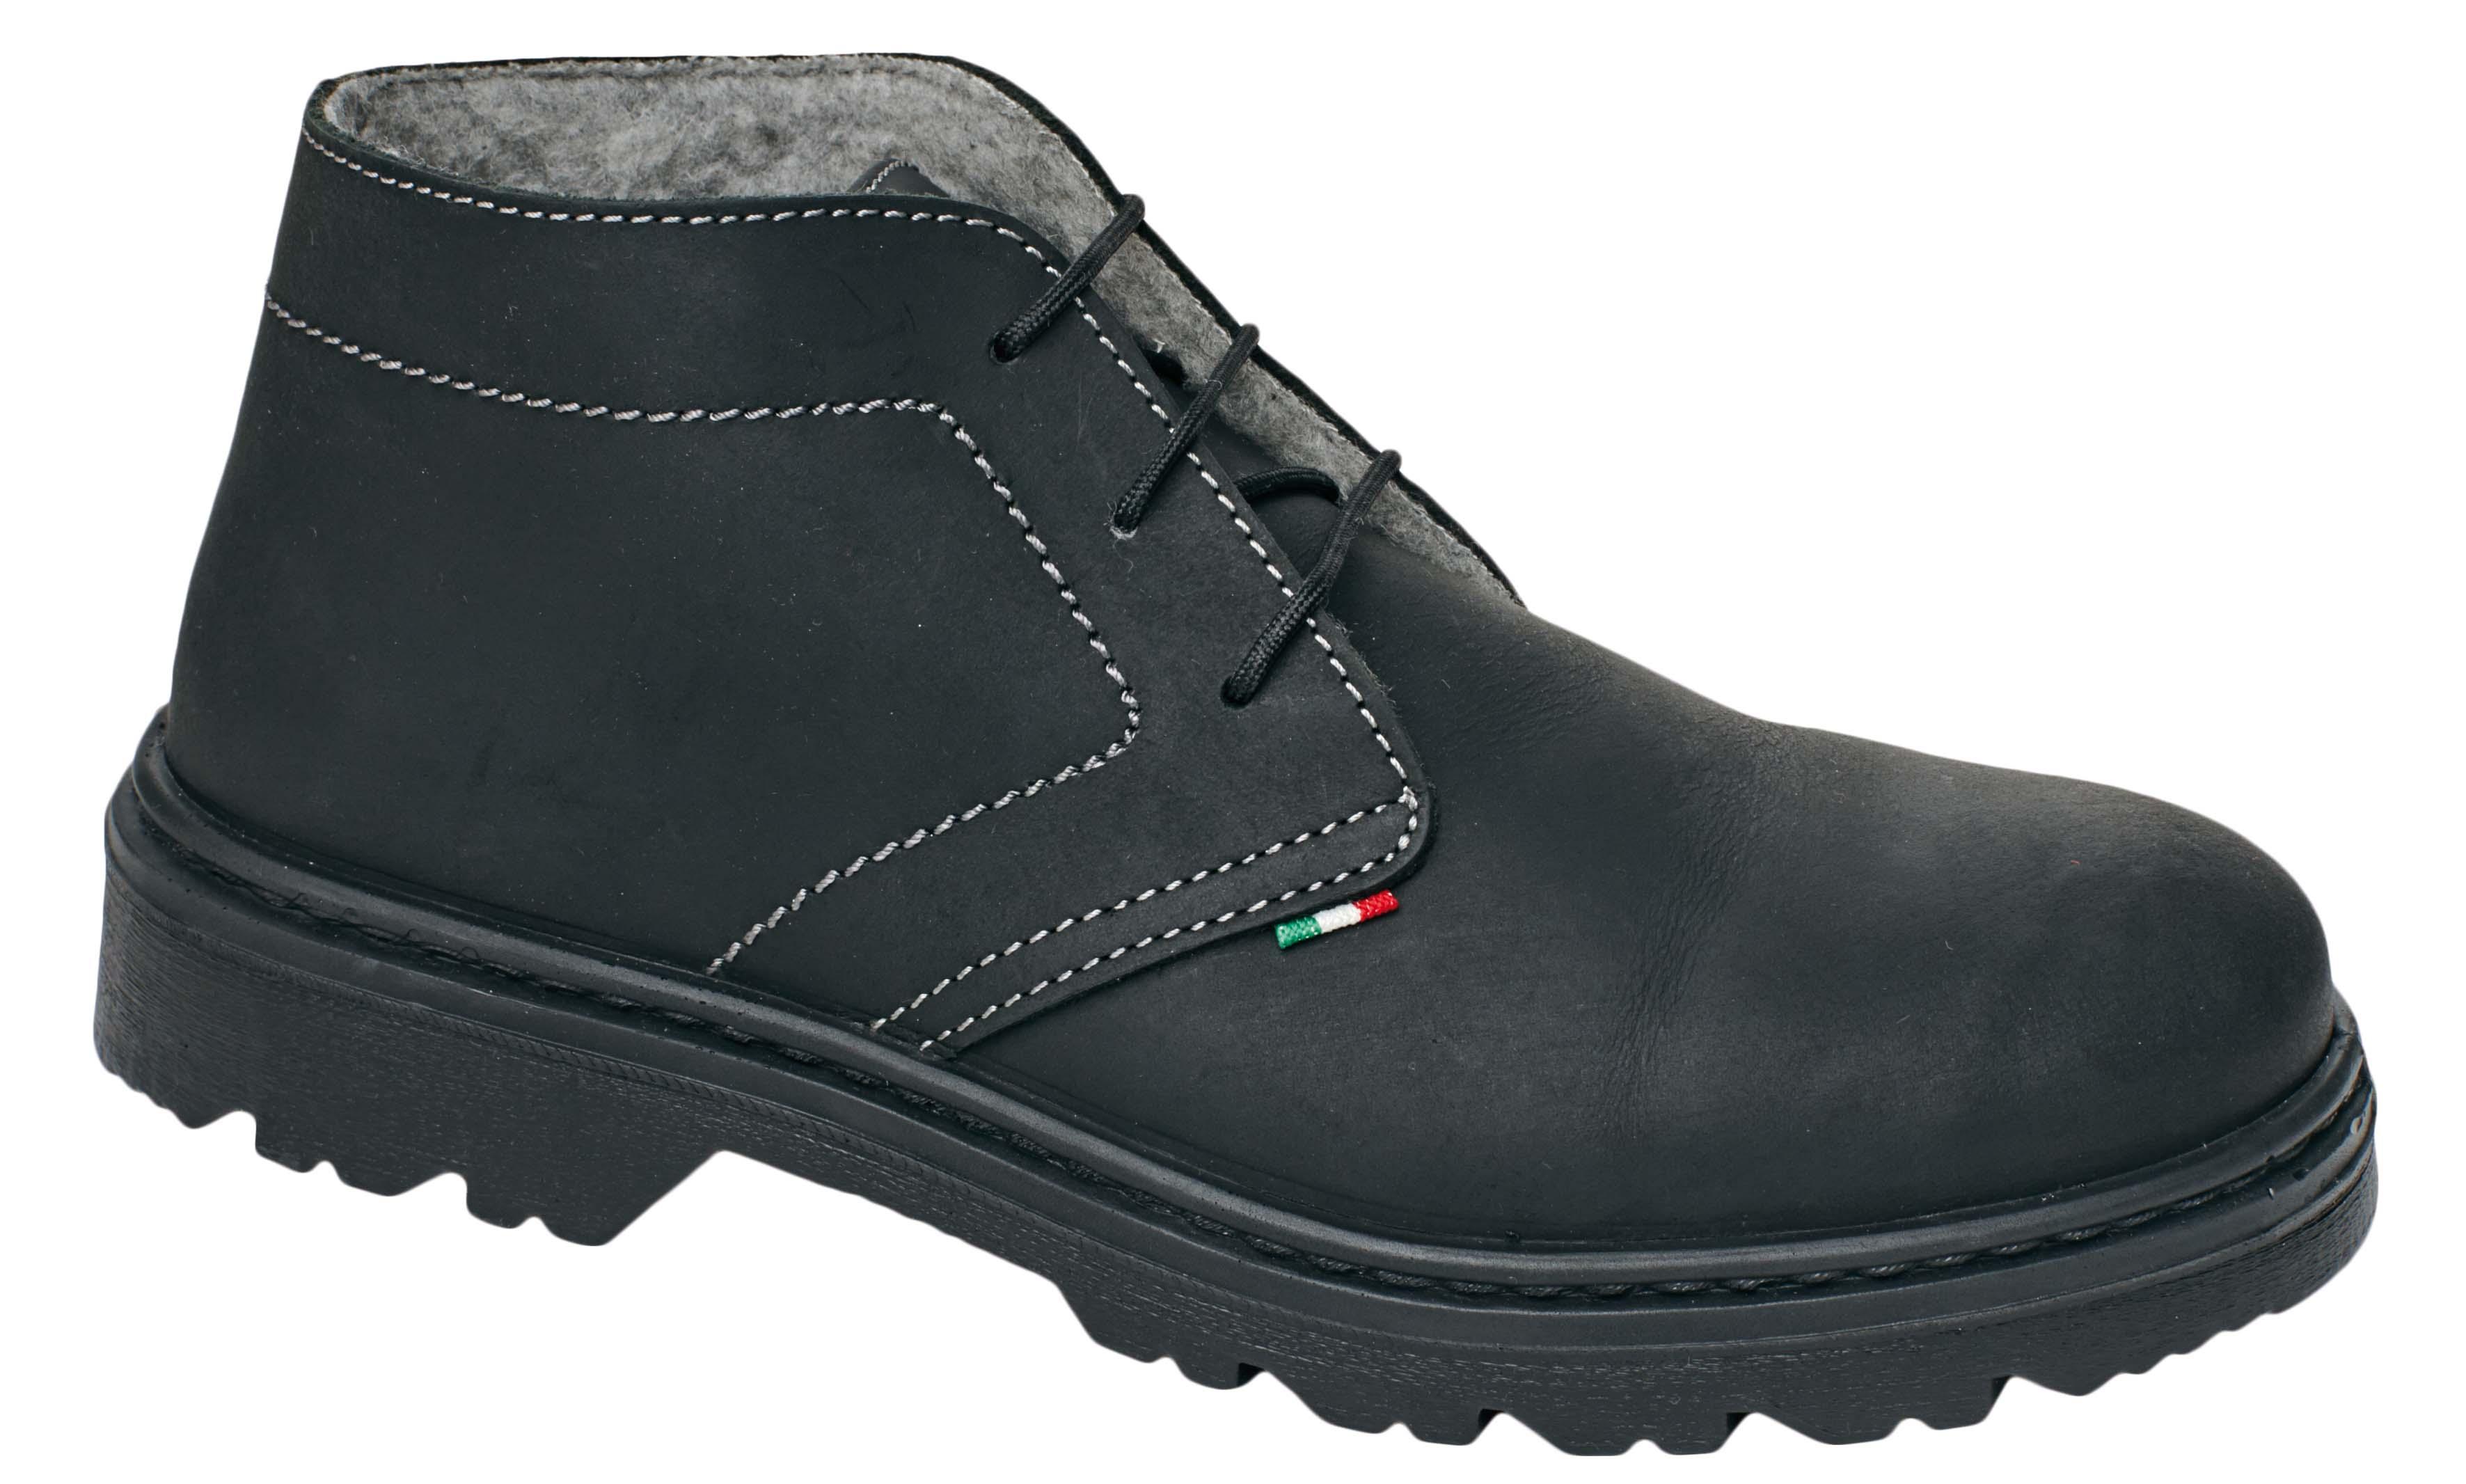 pracovní obuv SAFARI FRECCIA O2 Cl - 3934